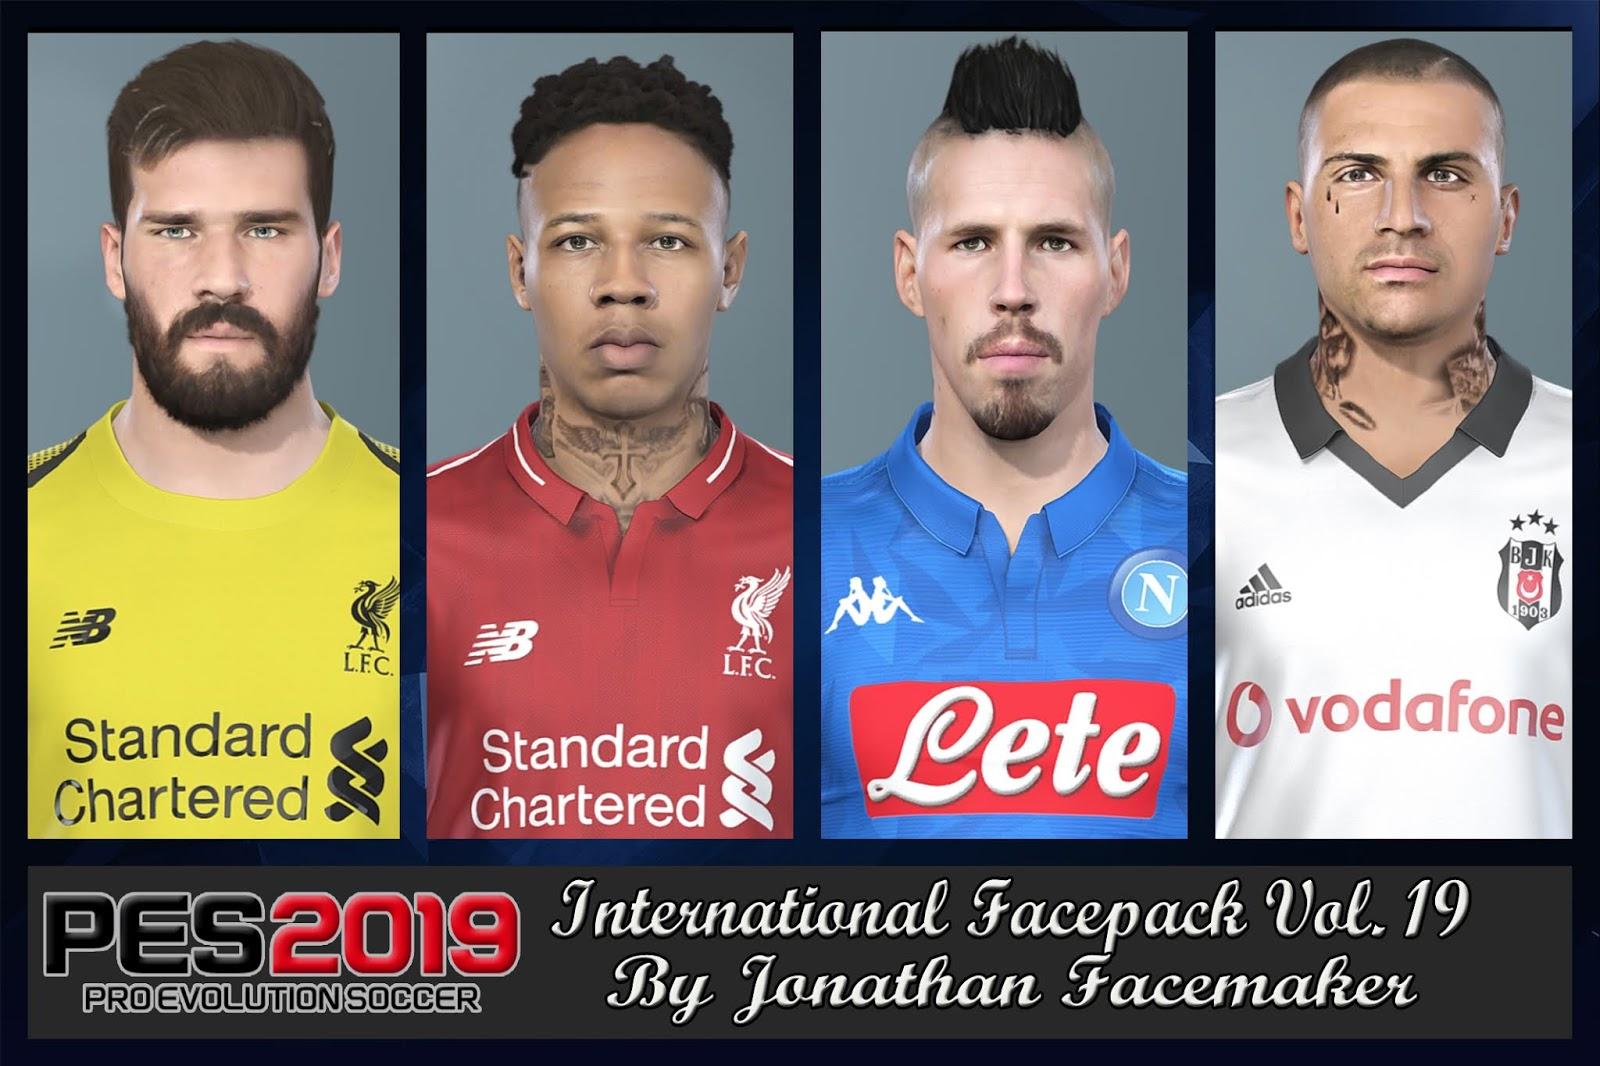 PES 2019 International Facepack Vol 19 by Jonathan Facemaker